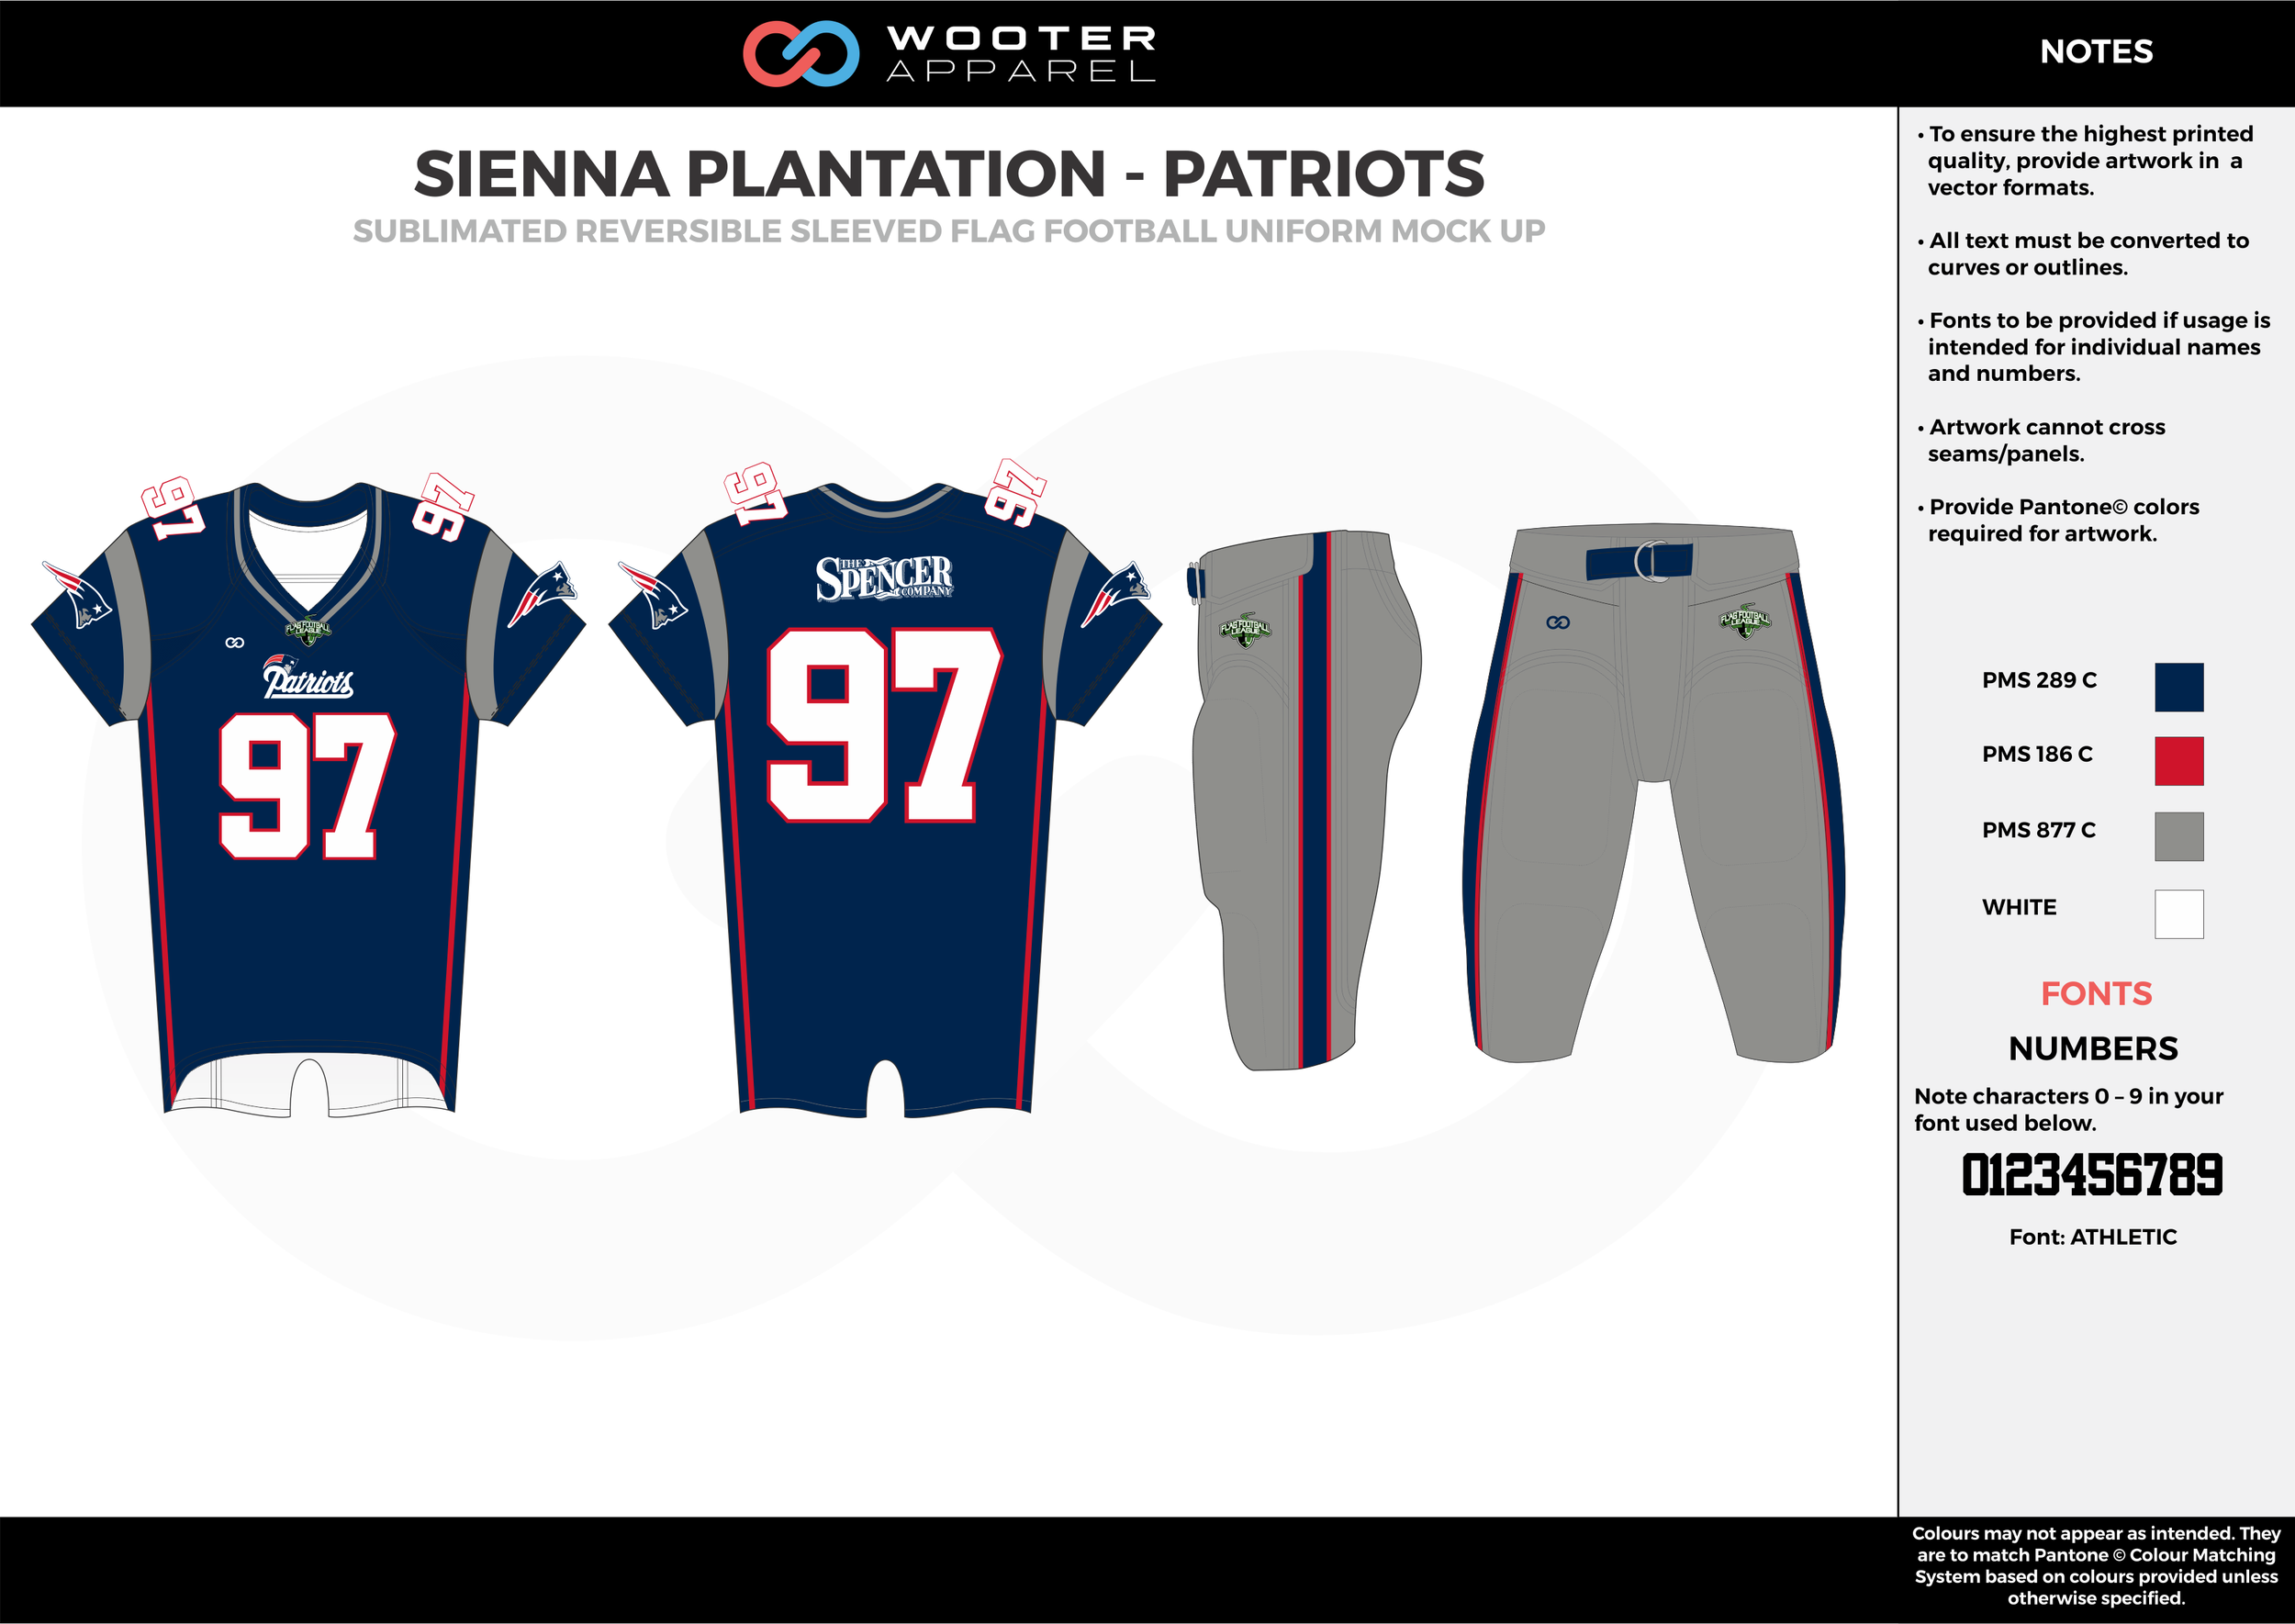 SIENNA PLANTATION - PATRIOTS blue red gray white Football Uniform, Jersey, Pants, Integraded